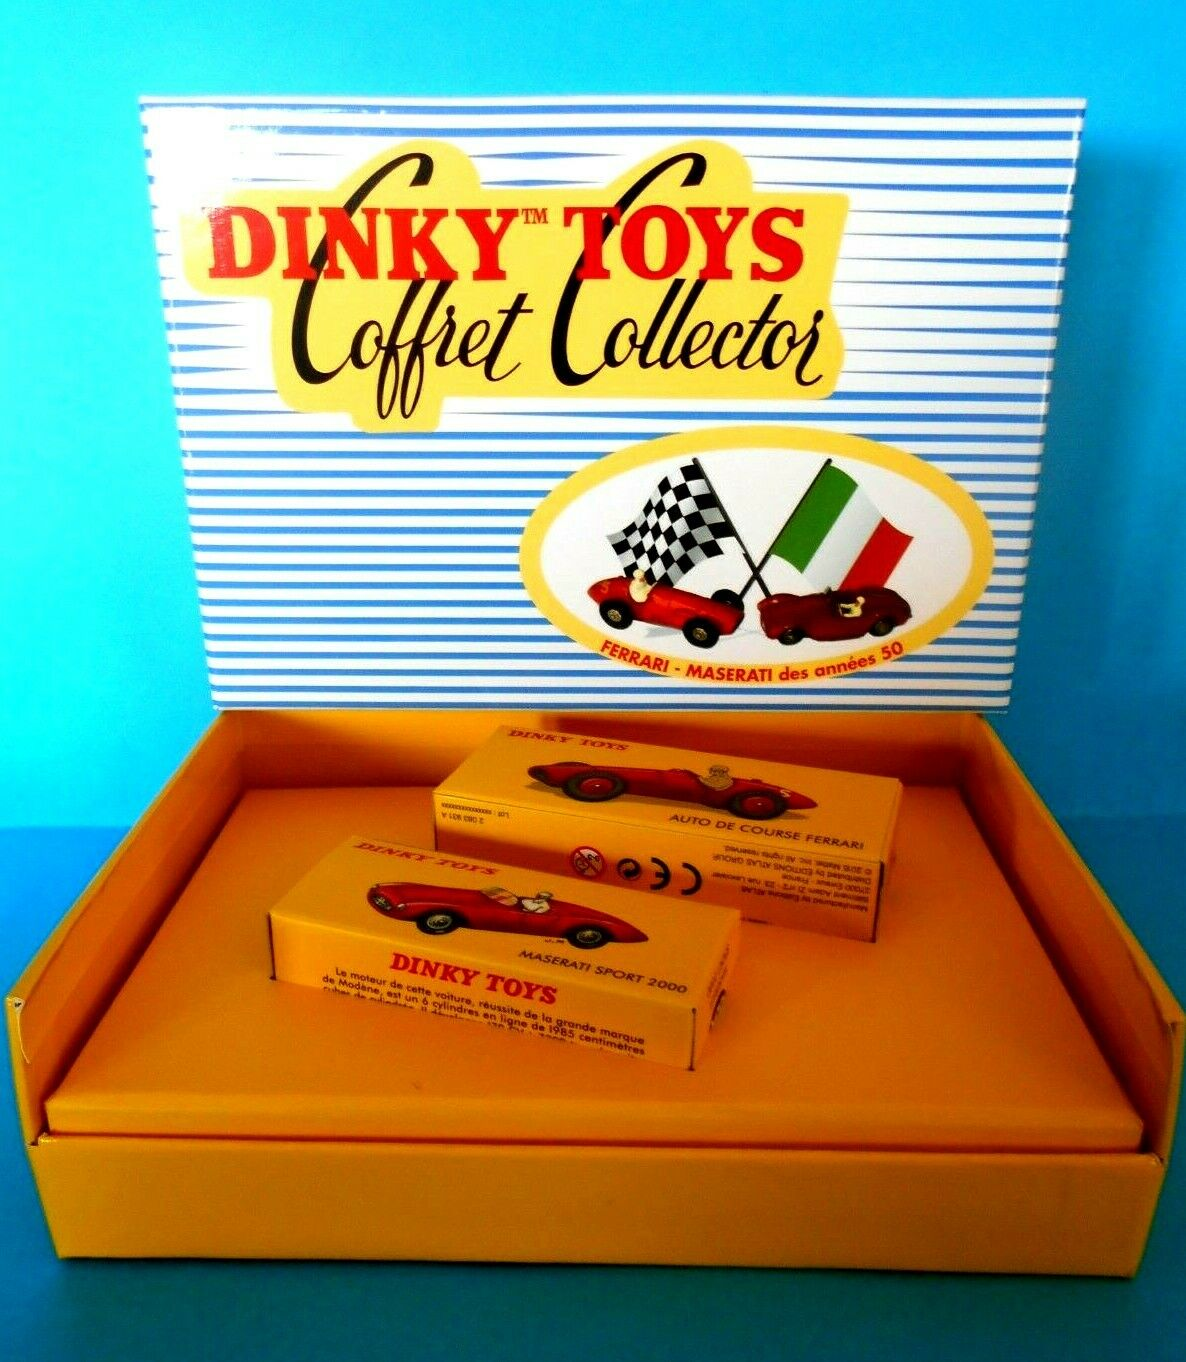 DINKY TOYS  COFFRET CF 01 FERRARI - MASERATI  2083931  ATLAS EDITIONS 1 43